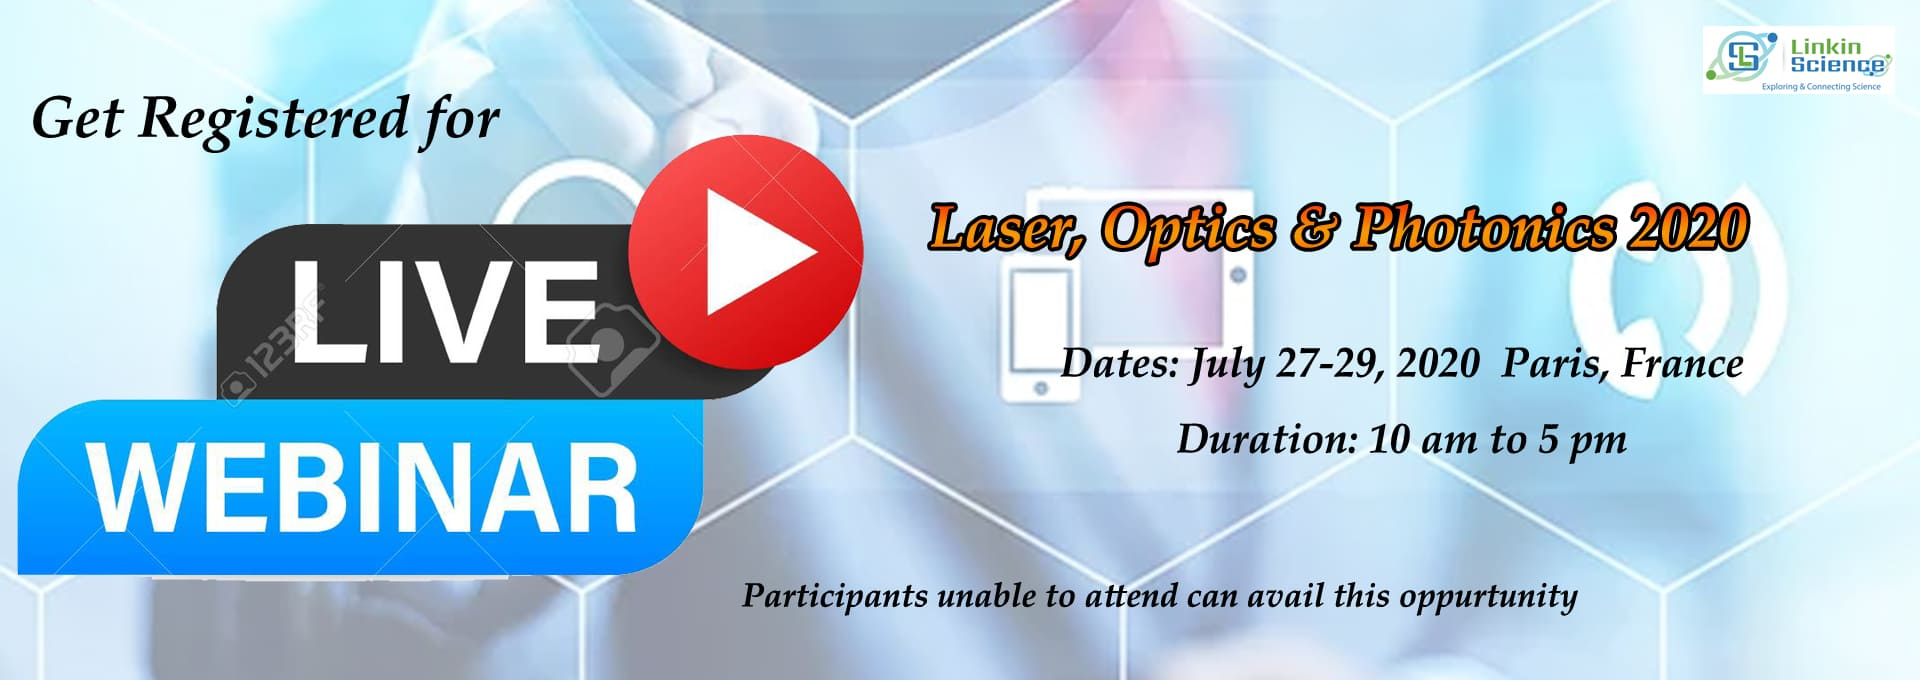 Laser optics and photonics 2020 live webinar opportunity